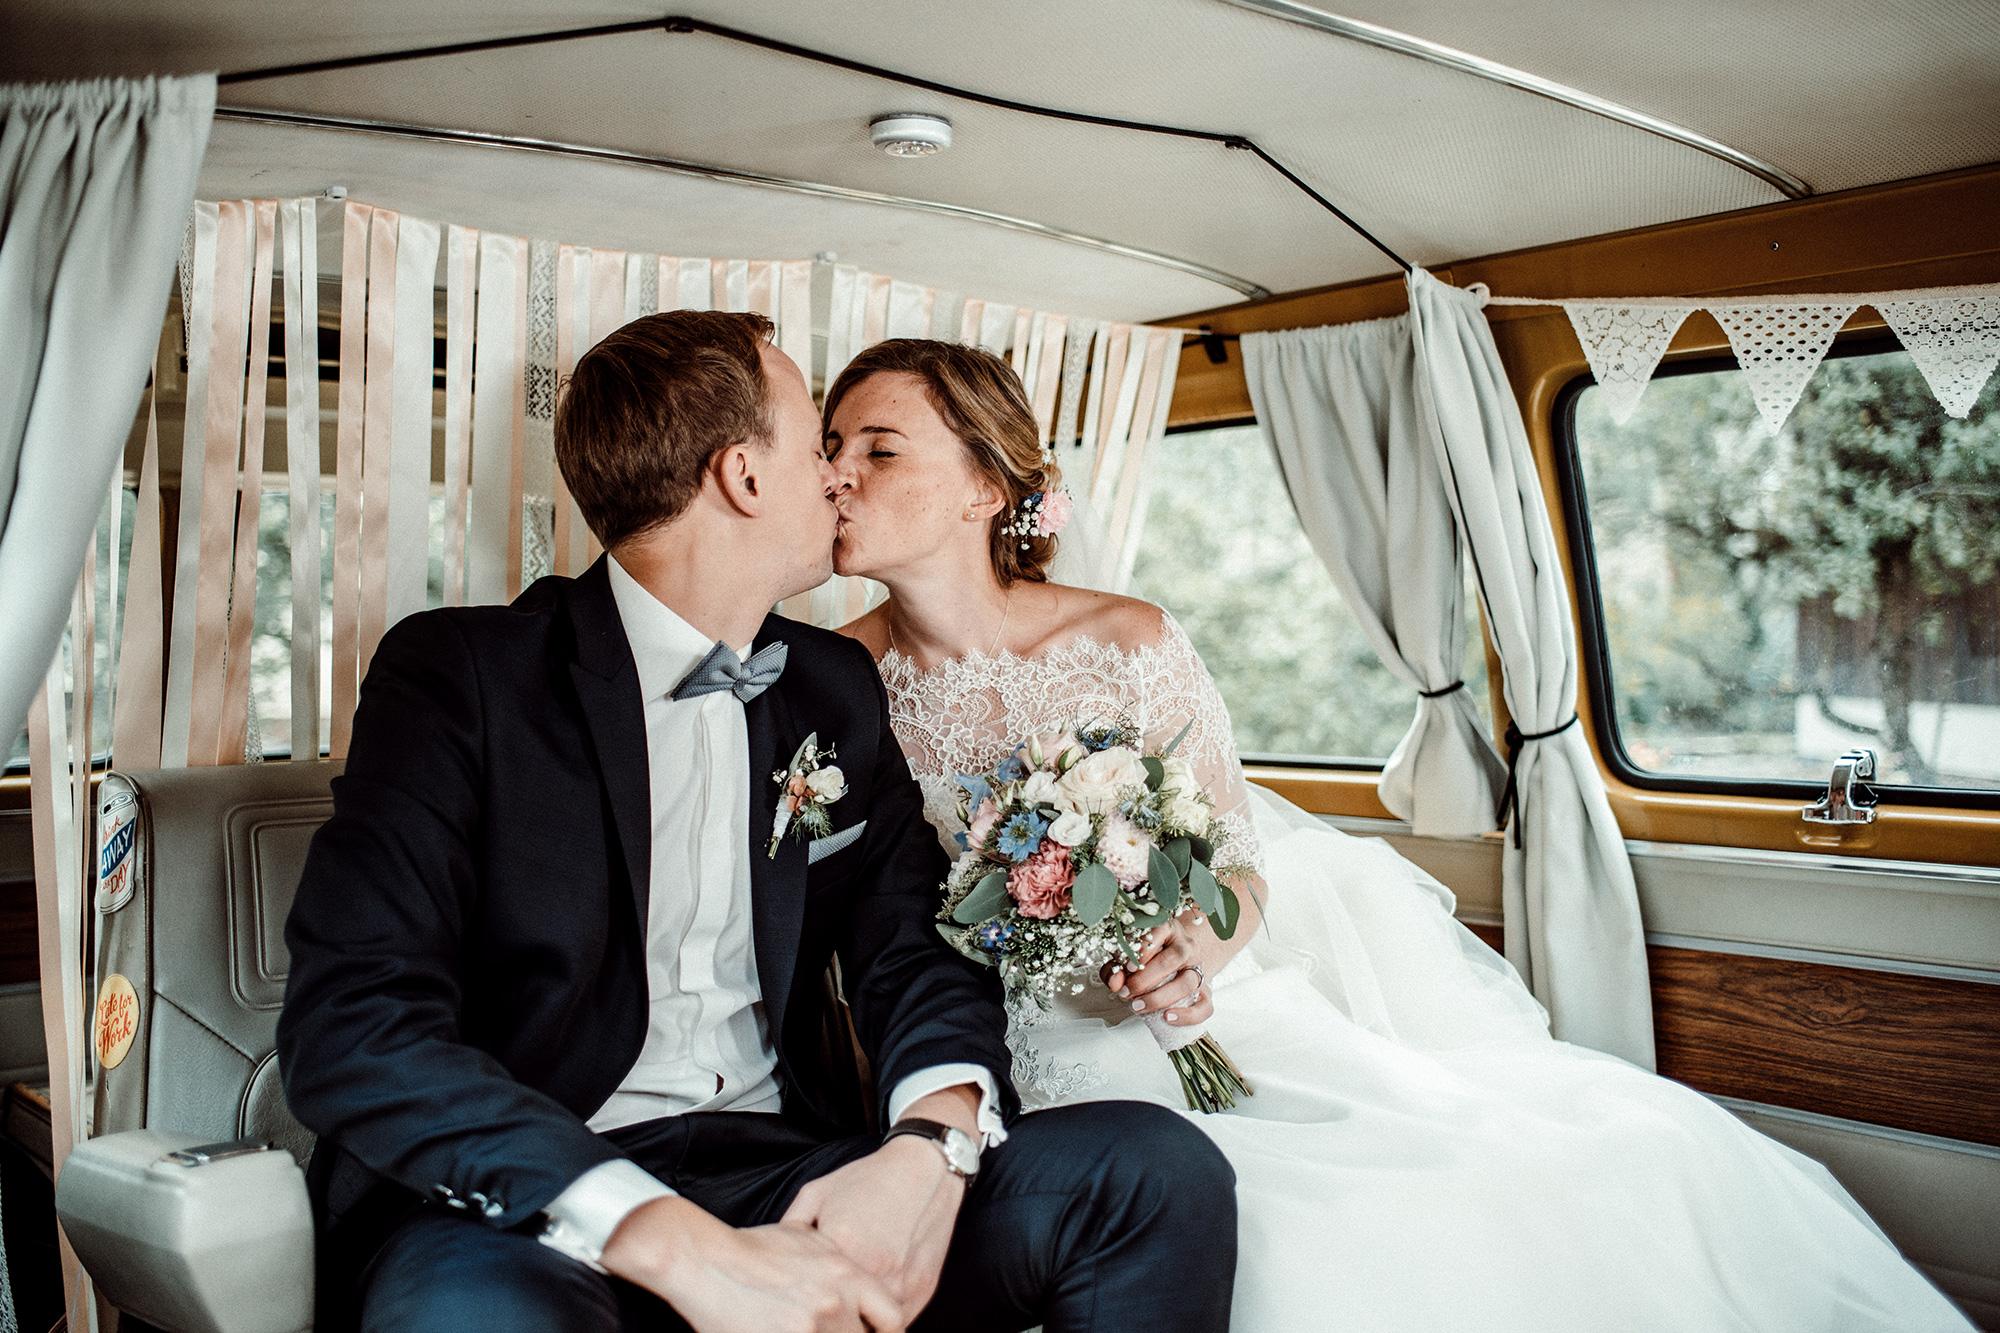 Hochzeit Jimmy Fotobus Brautpaar Kuss Bus Fotobooth Fotobox Photobooth